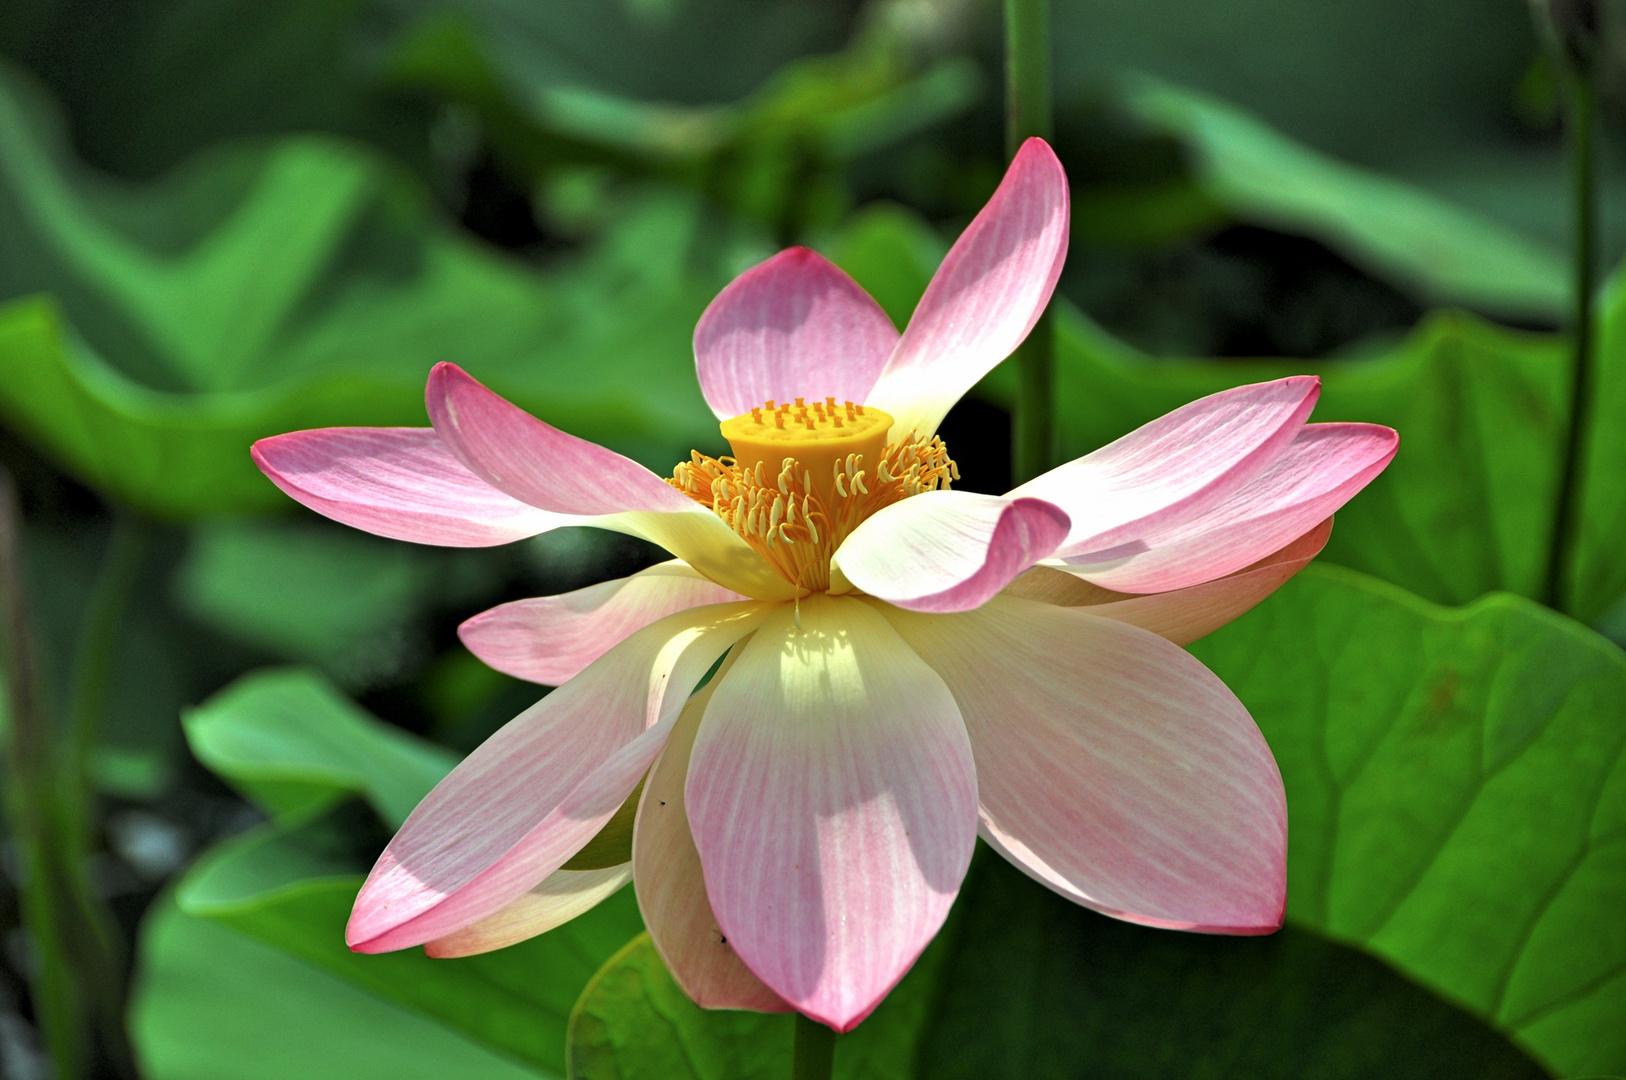 Indische Lotusblume (Nelumbo nucifera) im Arboretum Ellerhoop